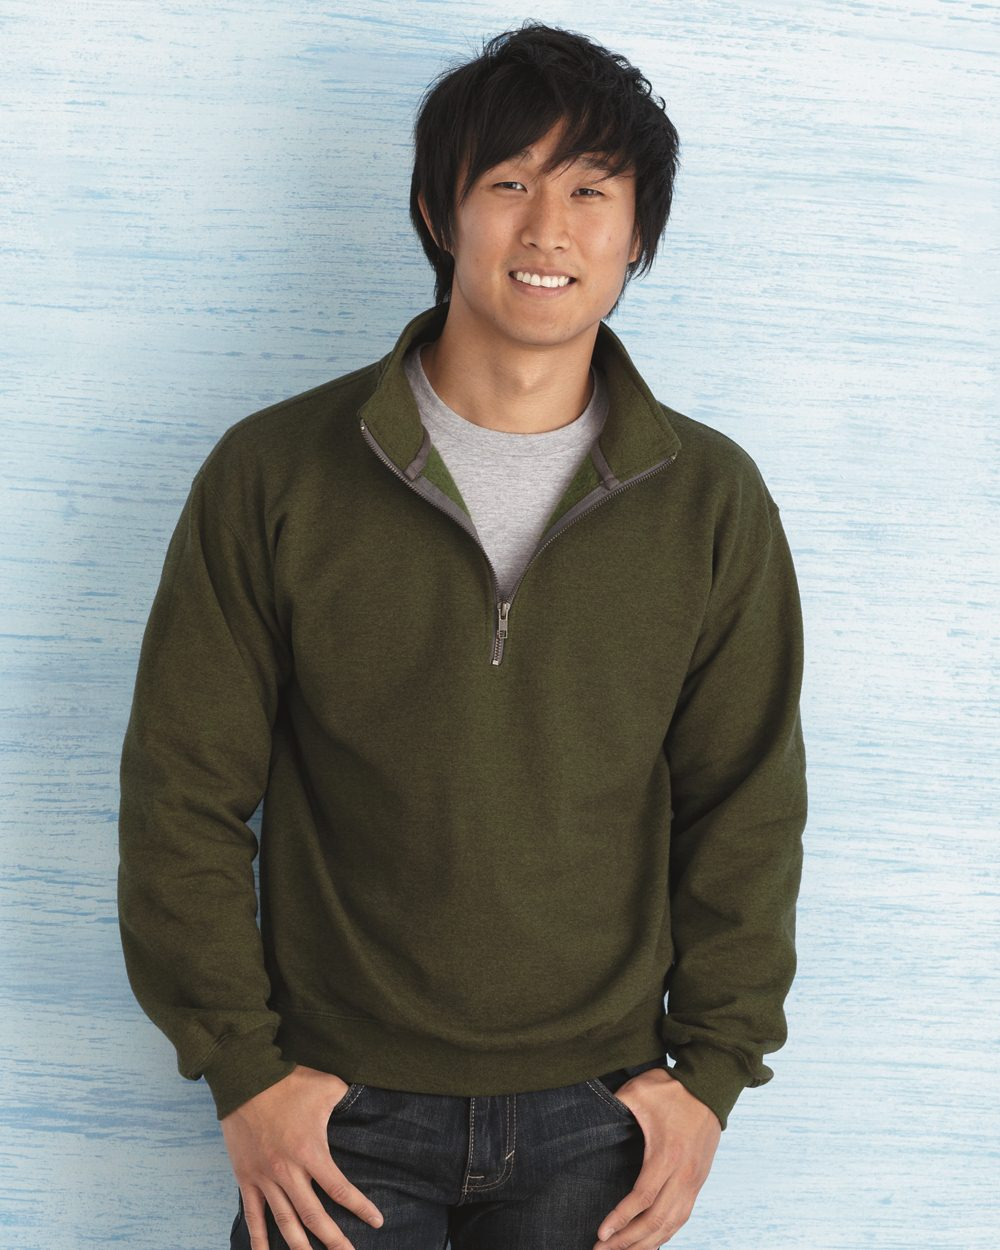 GILDAN Mens Fleece Quarter-Zip Cadet Collar Sweatshirt Shirt